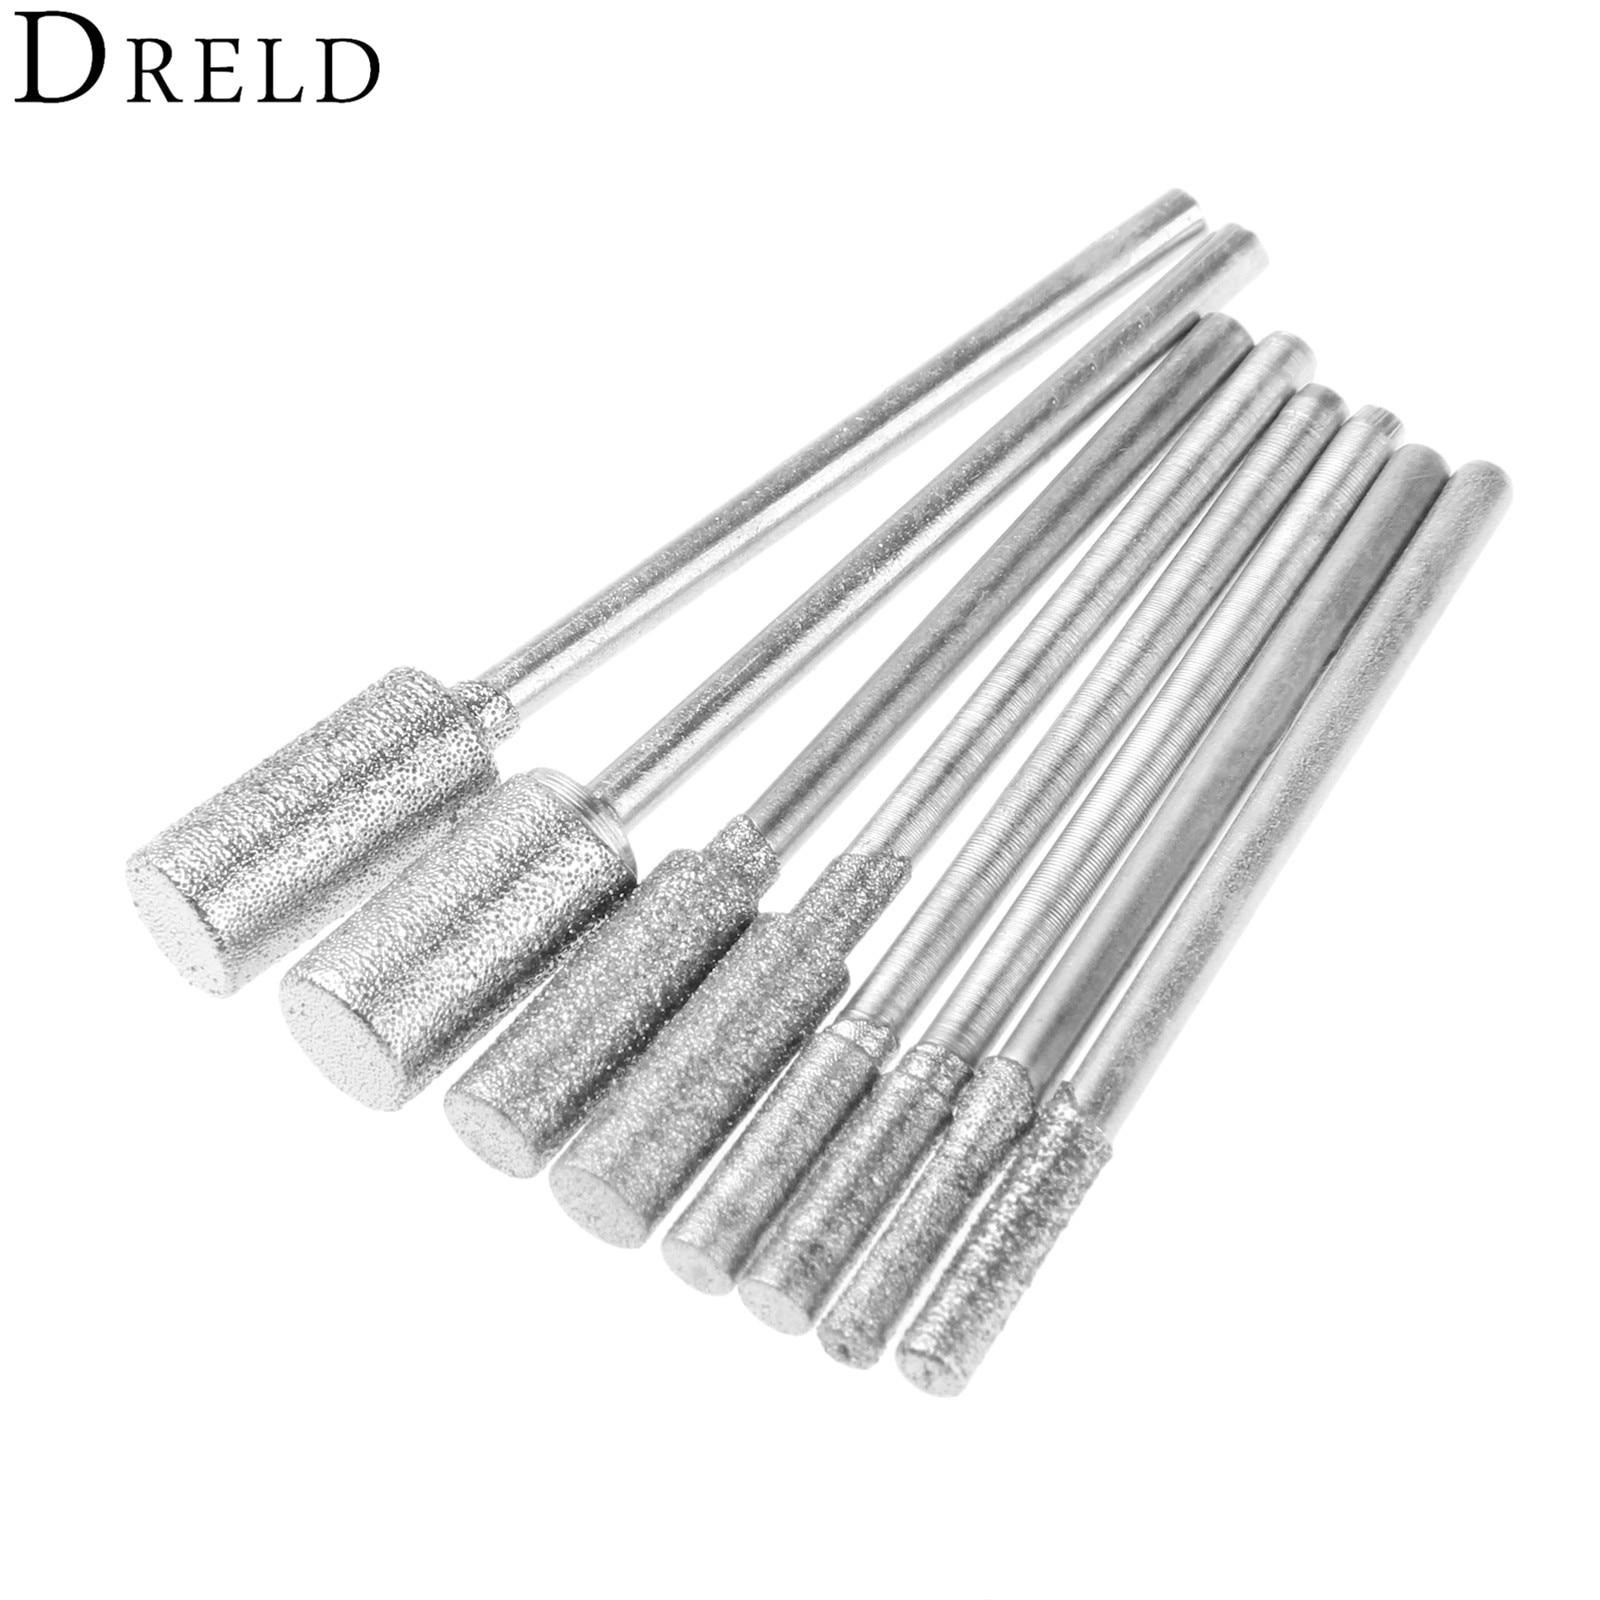 DRELD 8Pcs/set Diamond Cutting Grinding Head Mounted Points Bit 2.35mm Shank Jade Stone Carving Polishing For Dremel Rotary Tool